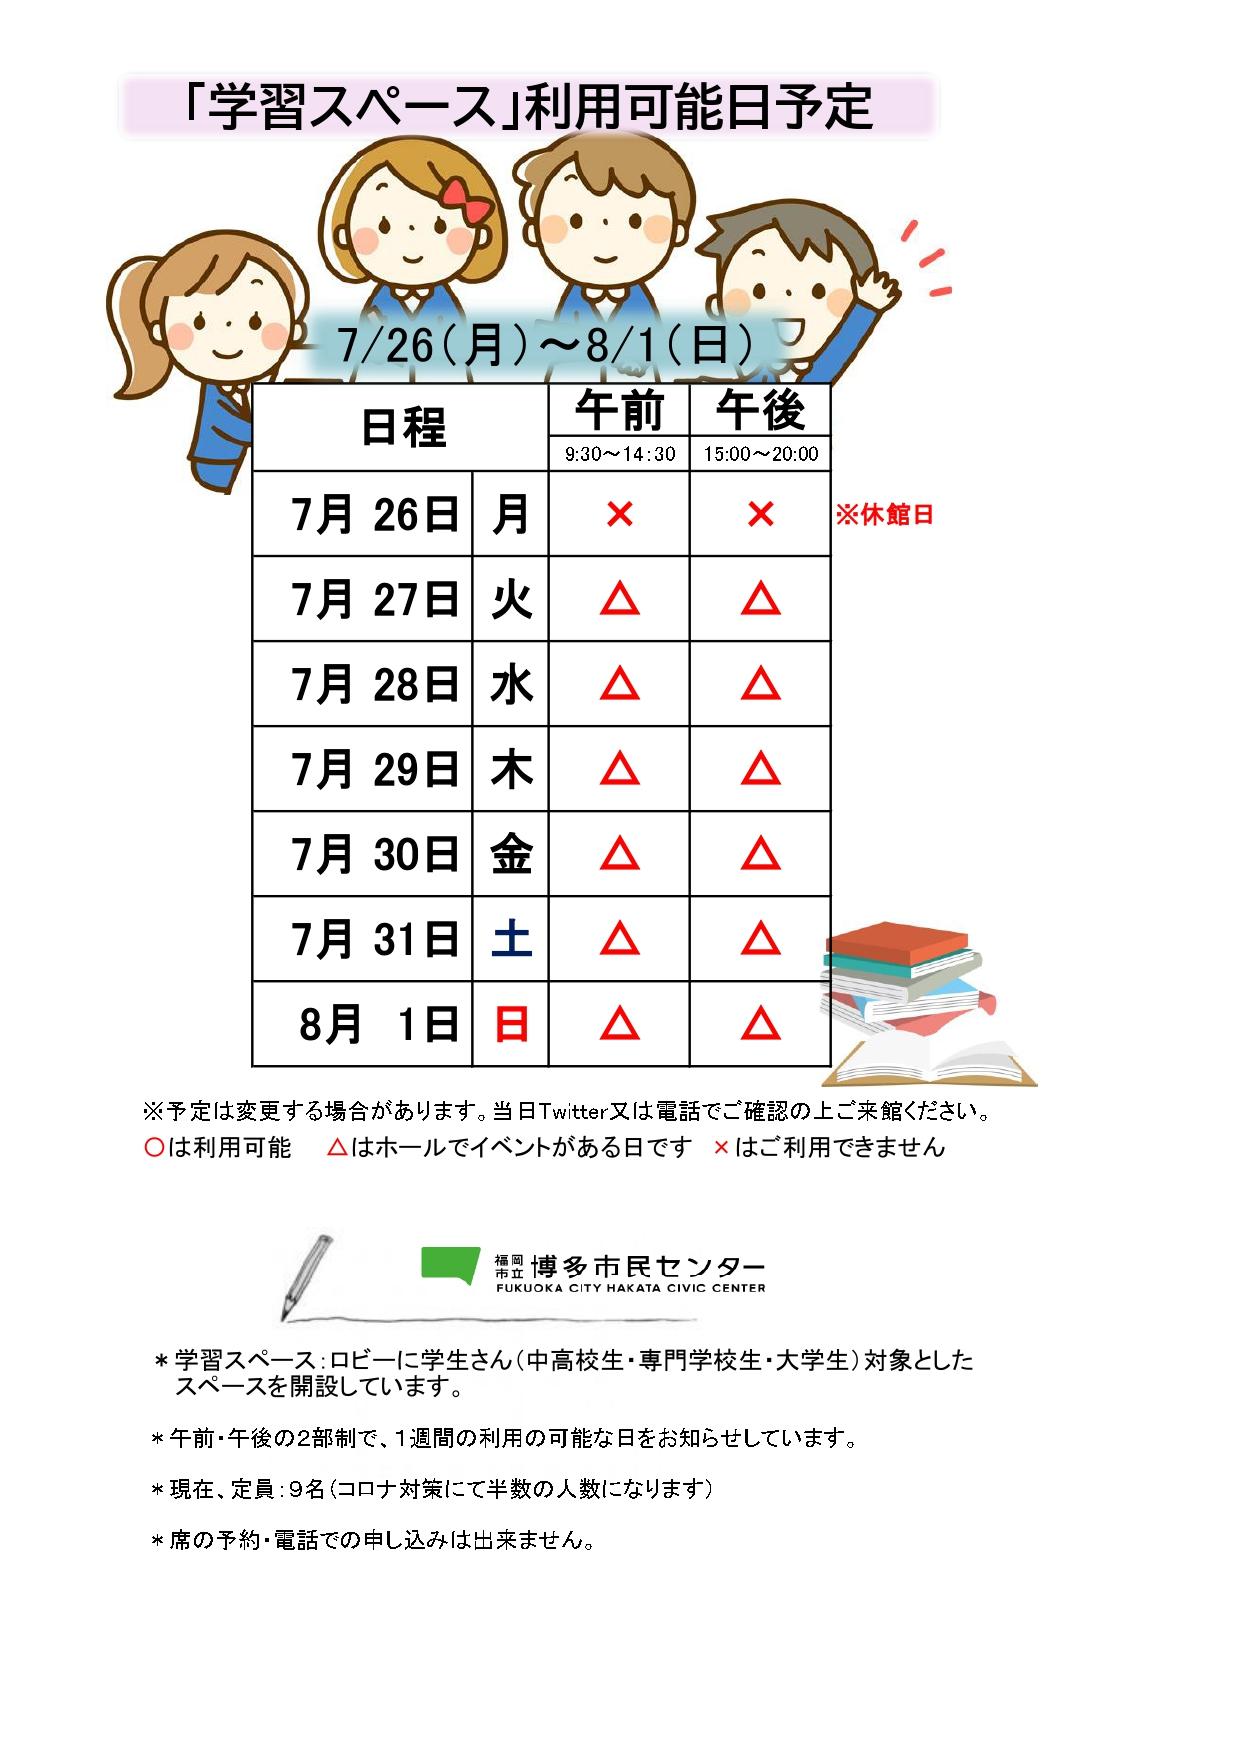 7月26日(月)〜8月1日(日)「学習スペース」利用可能日予定